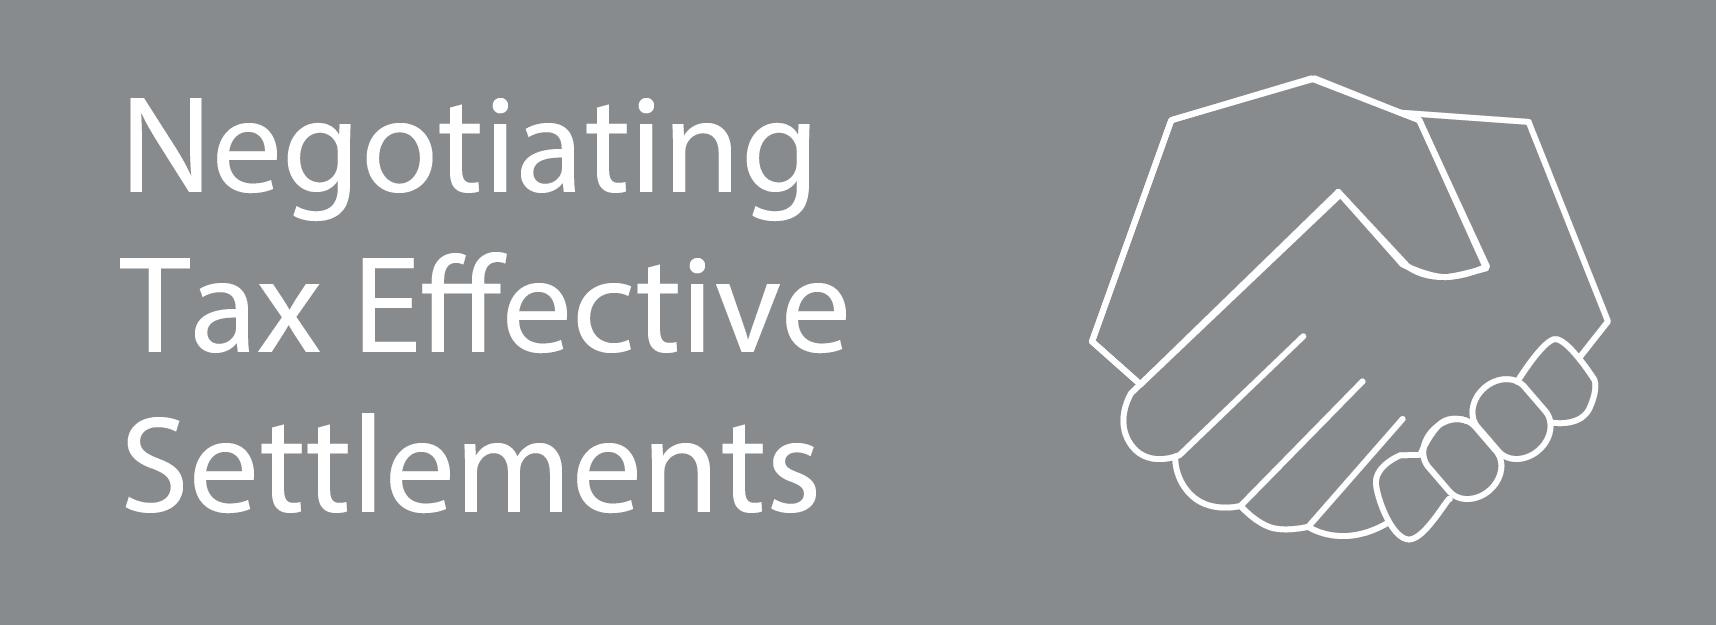 Tax Effective settlements